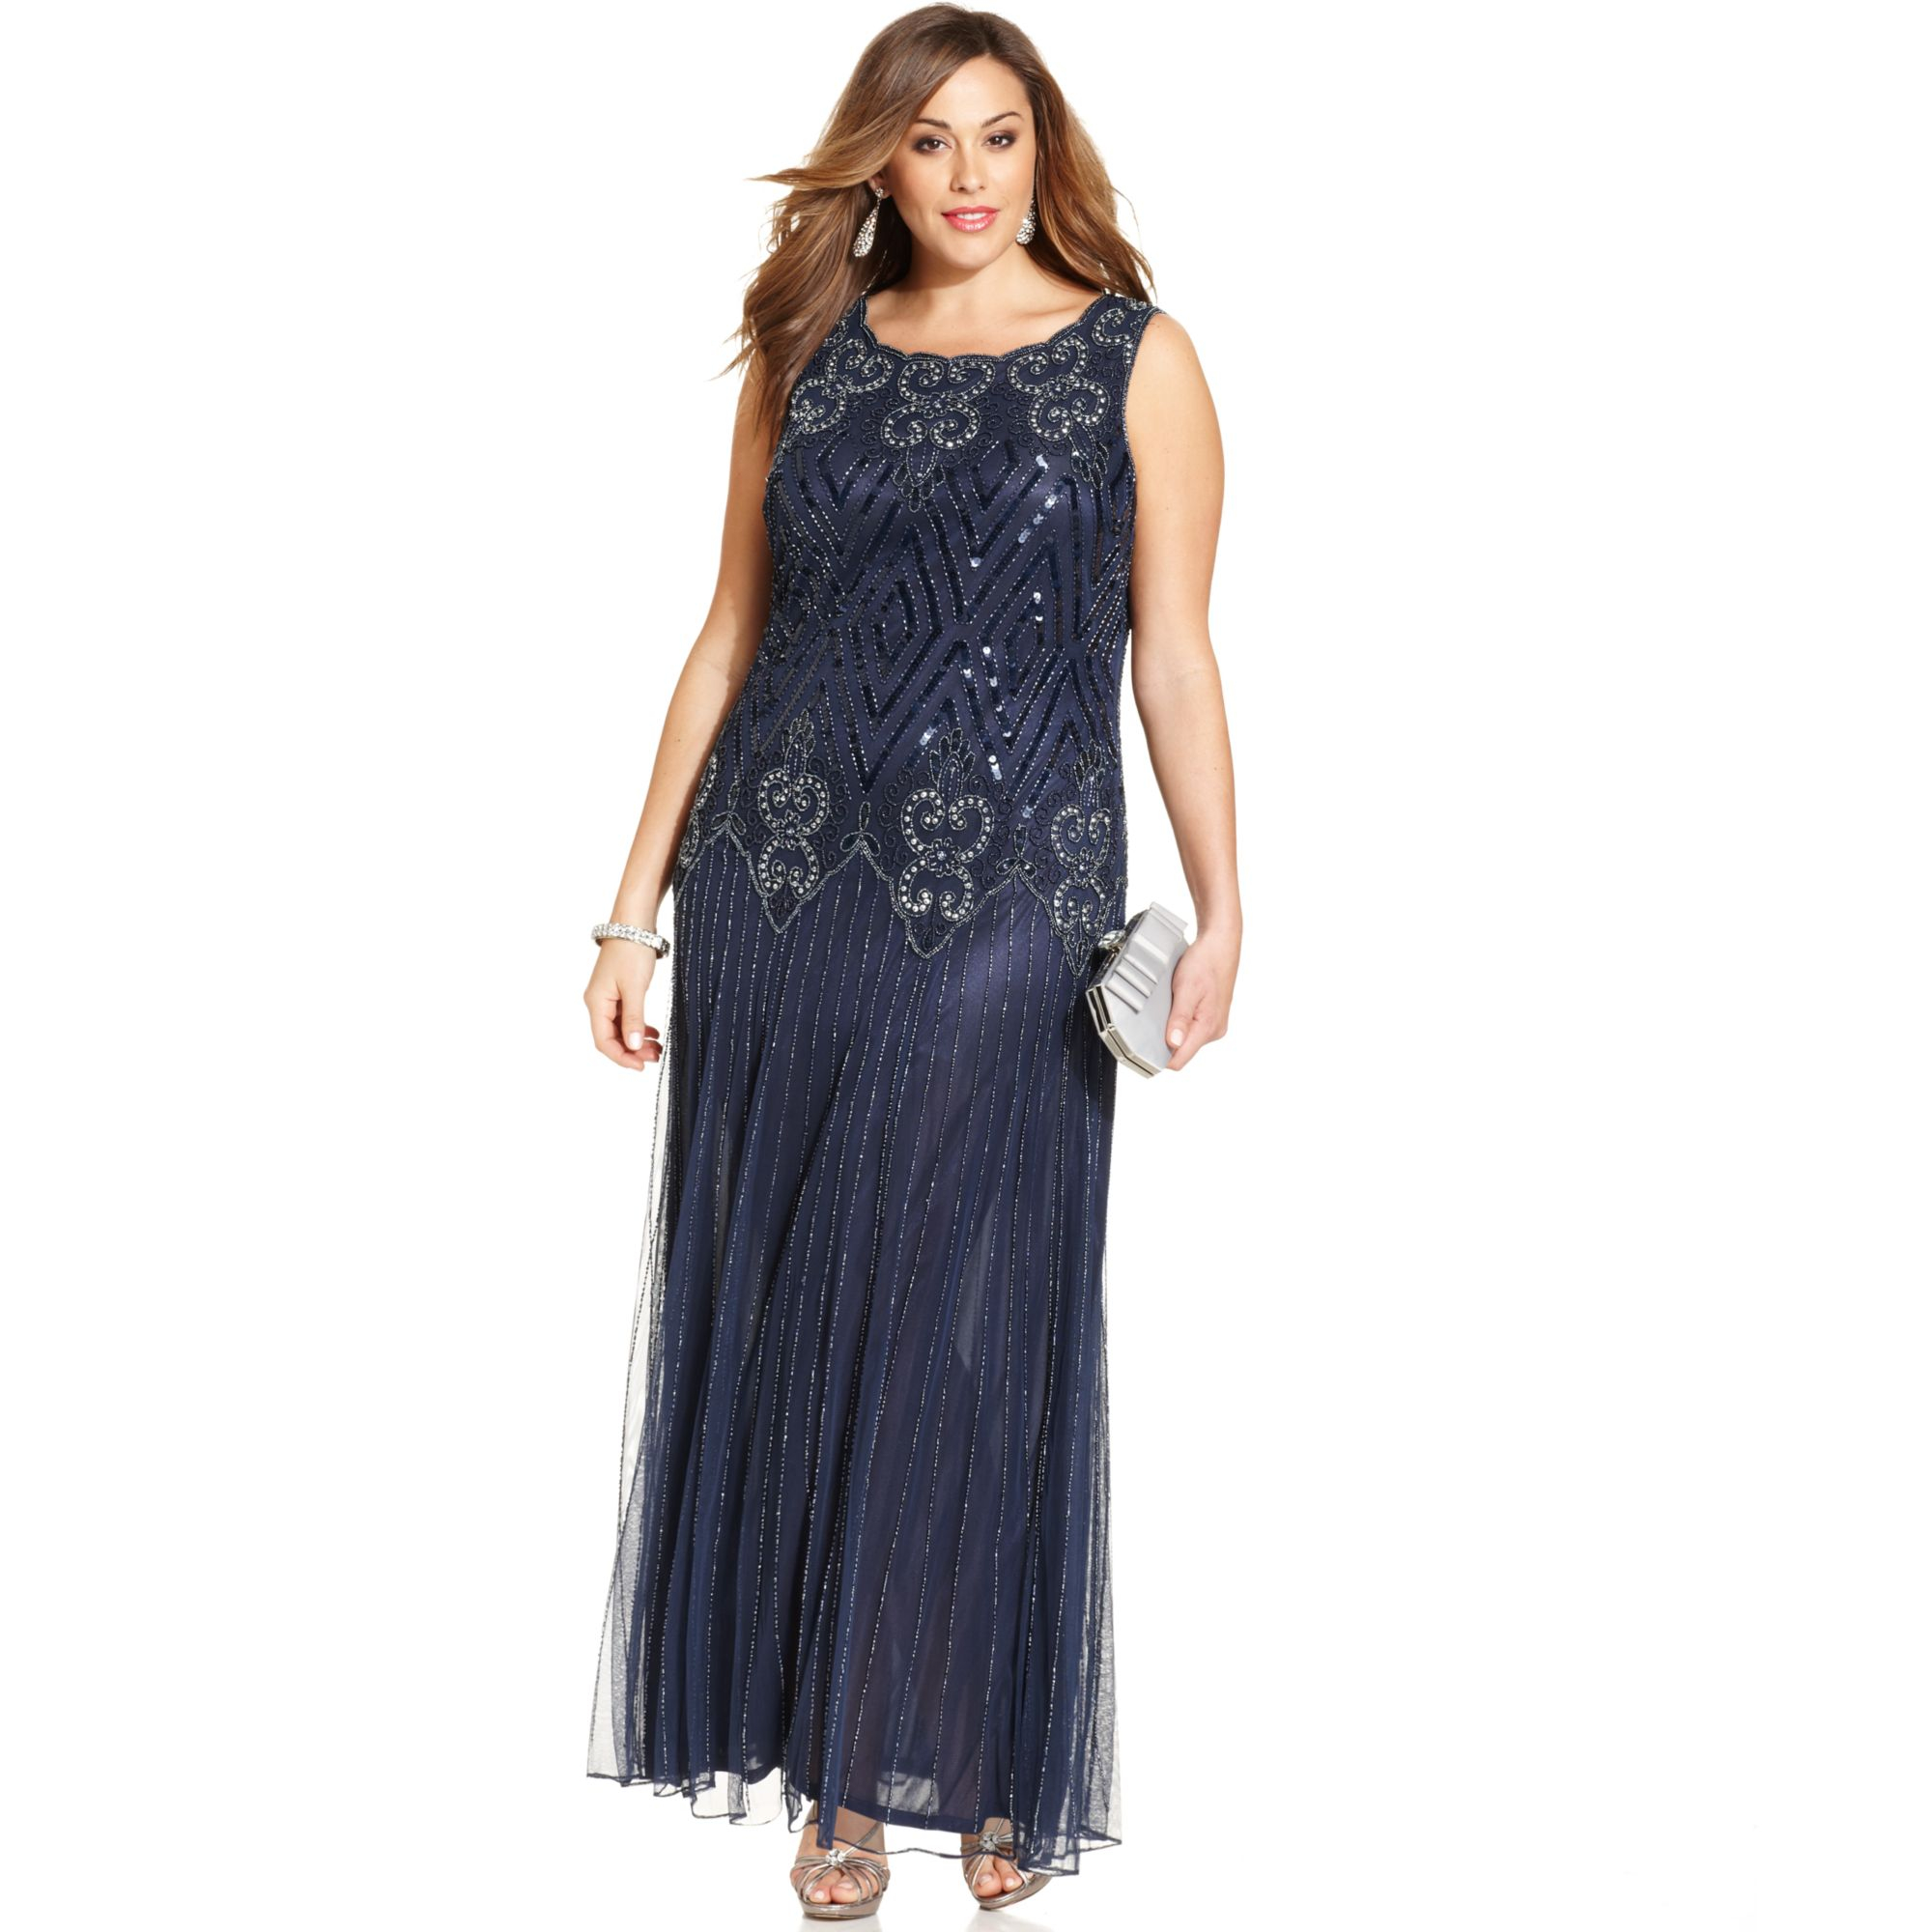 Lyst - Pisarro nights Plus Size Beaded Sequin Gown in Blue